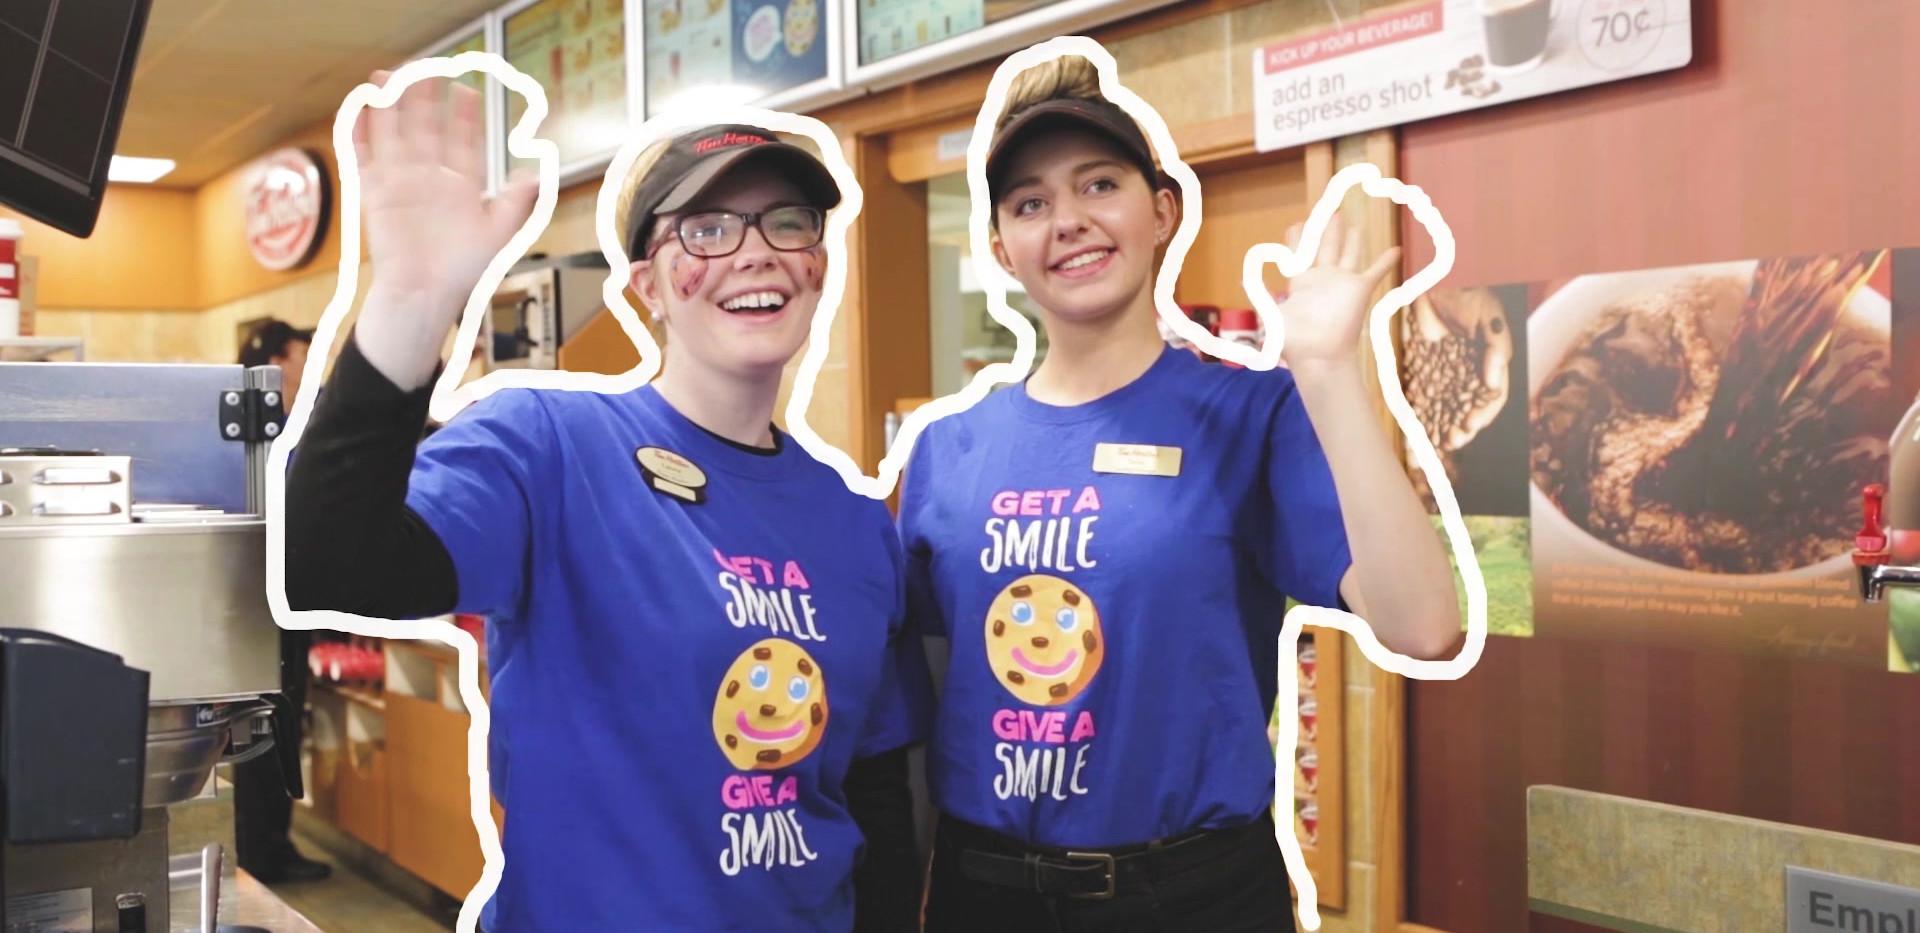 IWK Foundation - Tim Horton's Smile Cookie